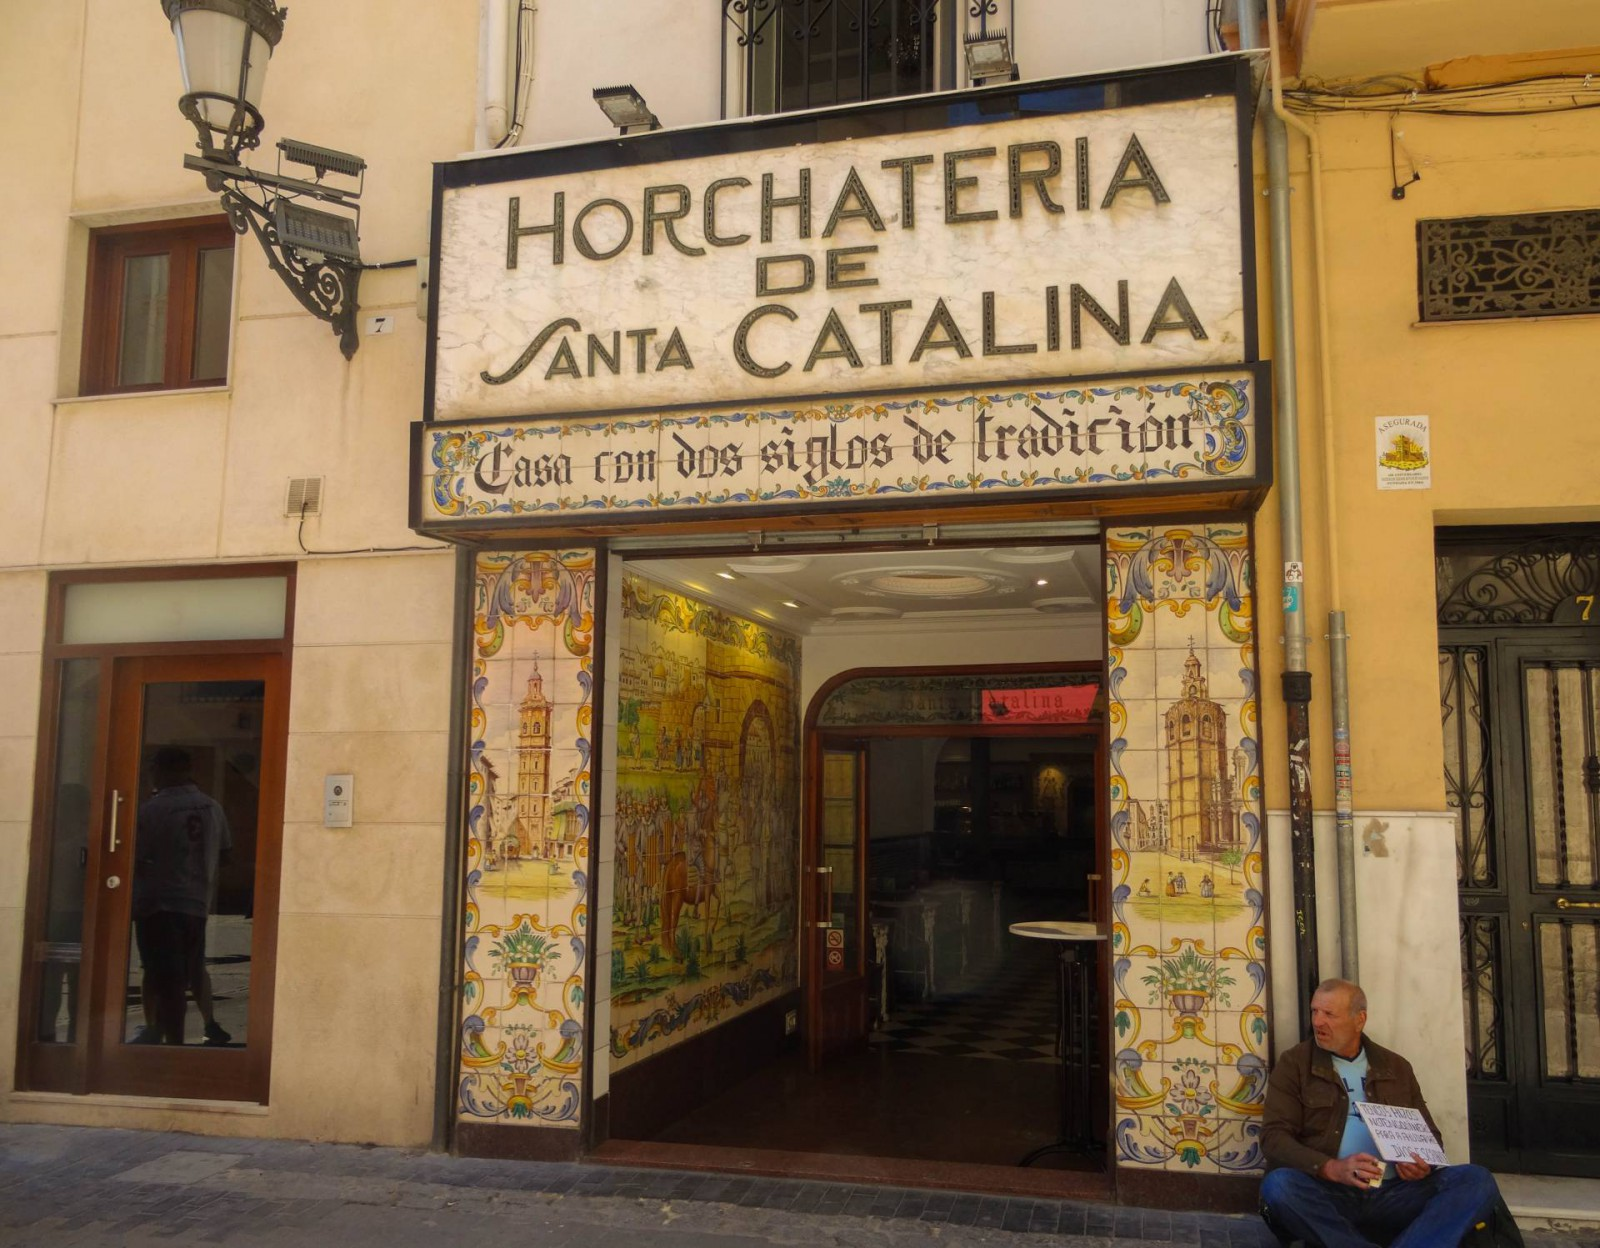 Horchateria de Santa Catalina, Valencia